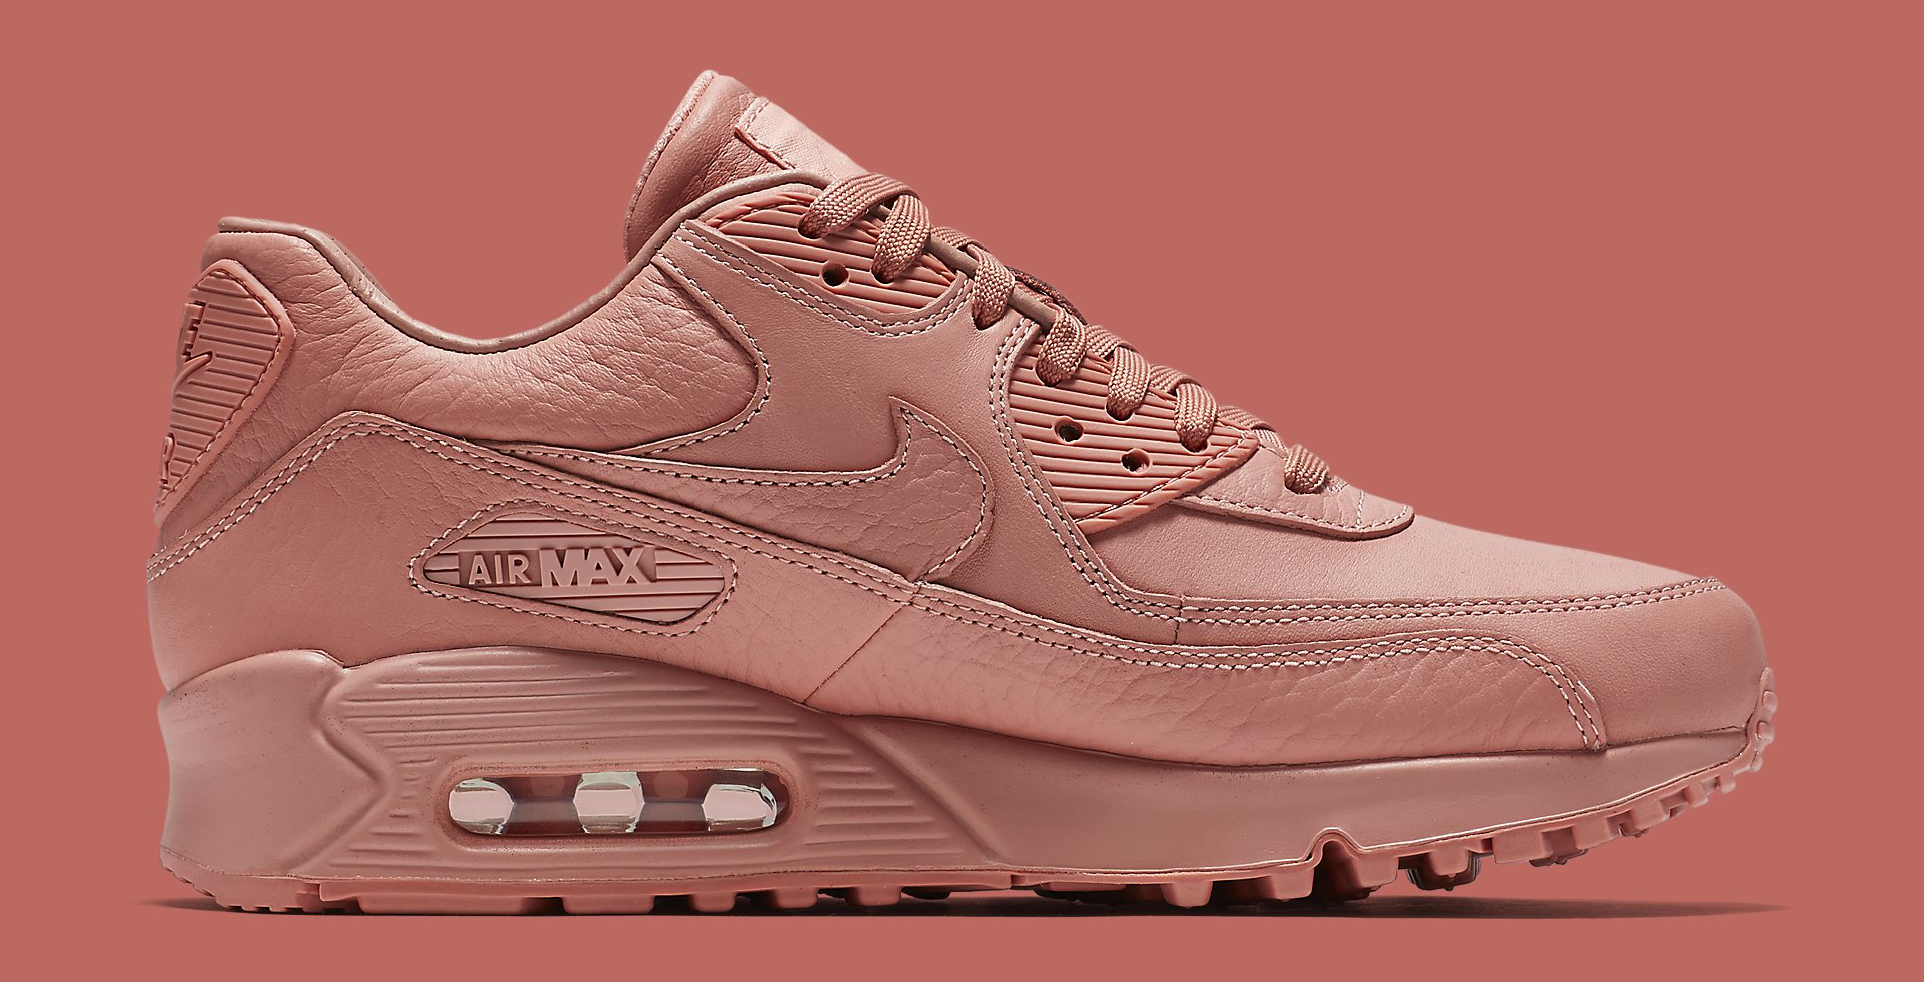 89870a4c1b47 Image via Nike Nike Air Max 90 Pinnacle Pink 839612-601 Medial